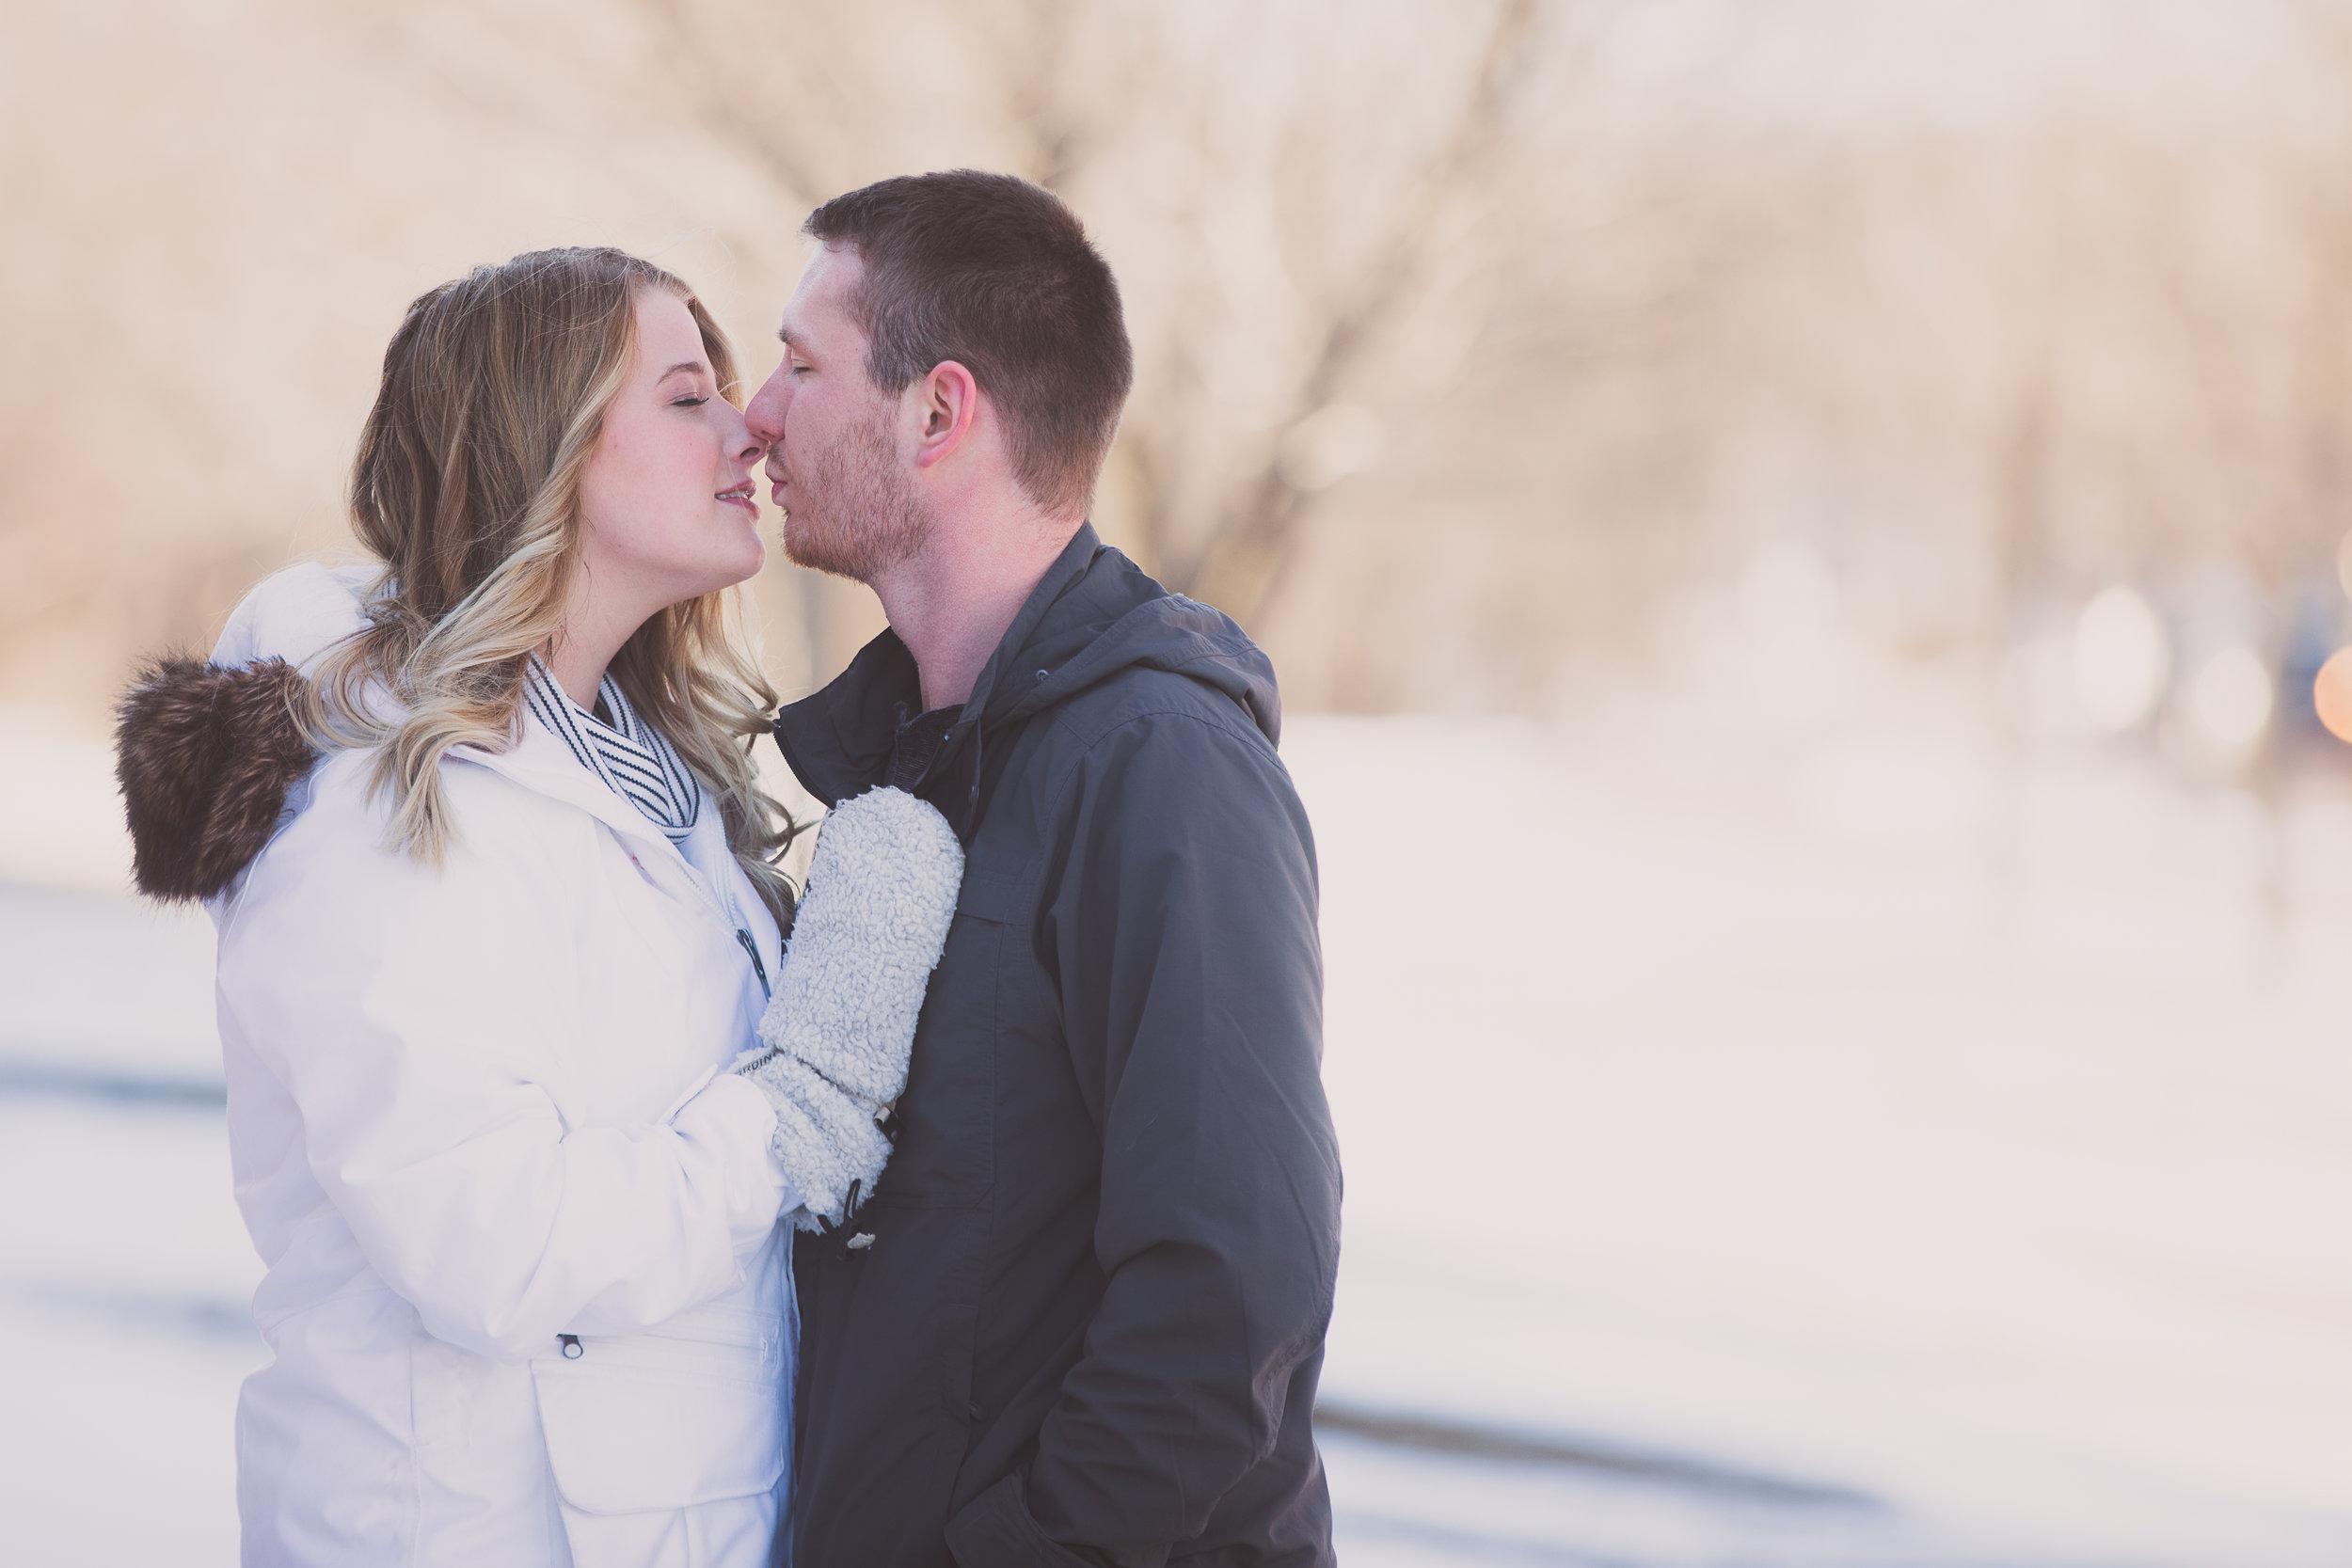 20180408_Jared&Jessica_Engagement-18.jpg